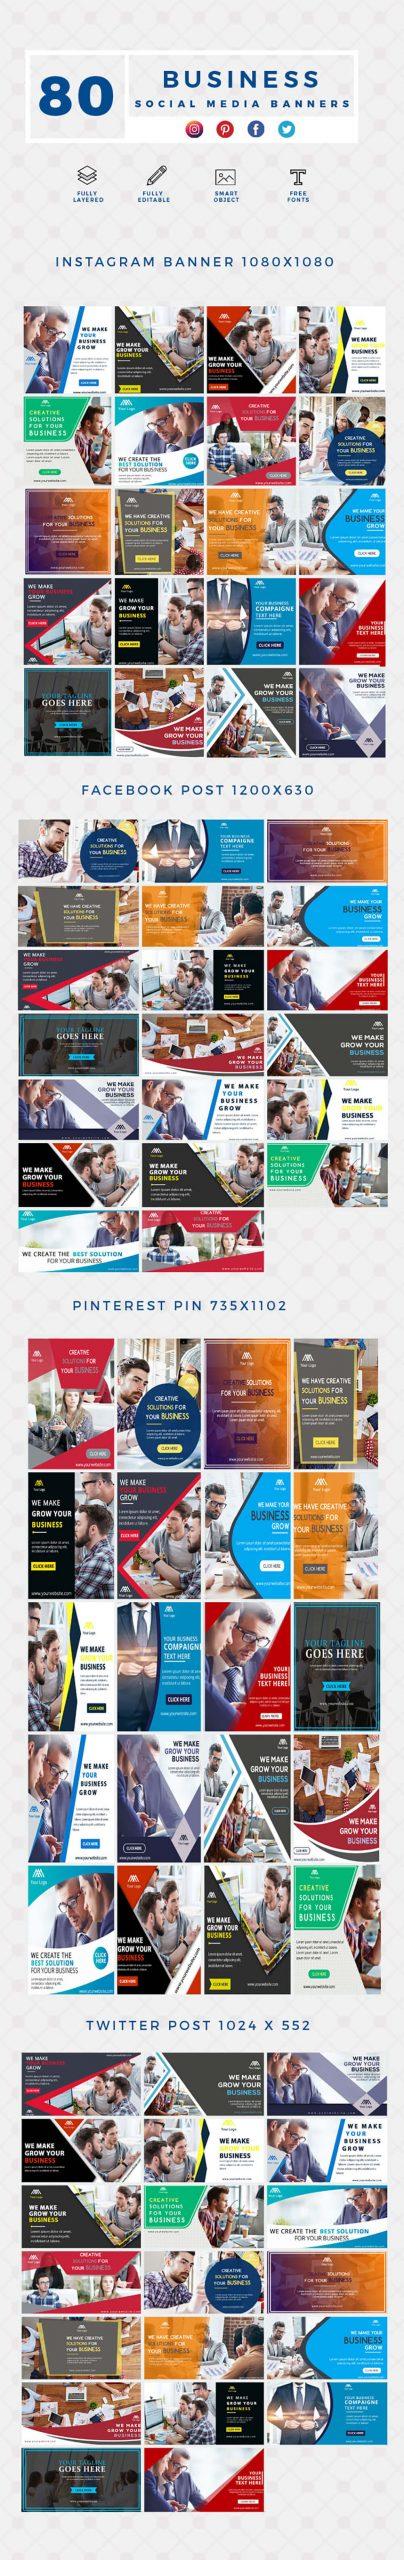 640 Social Media Banner Templates Bundle PREVIEW-BUSINESS